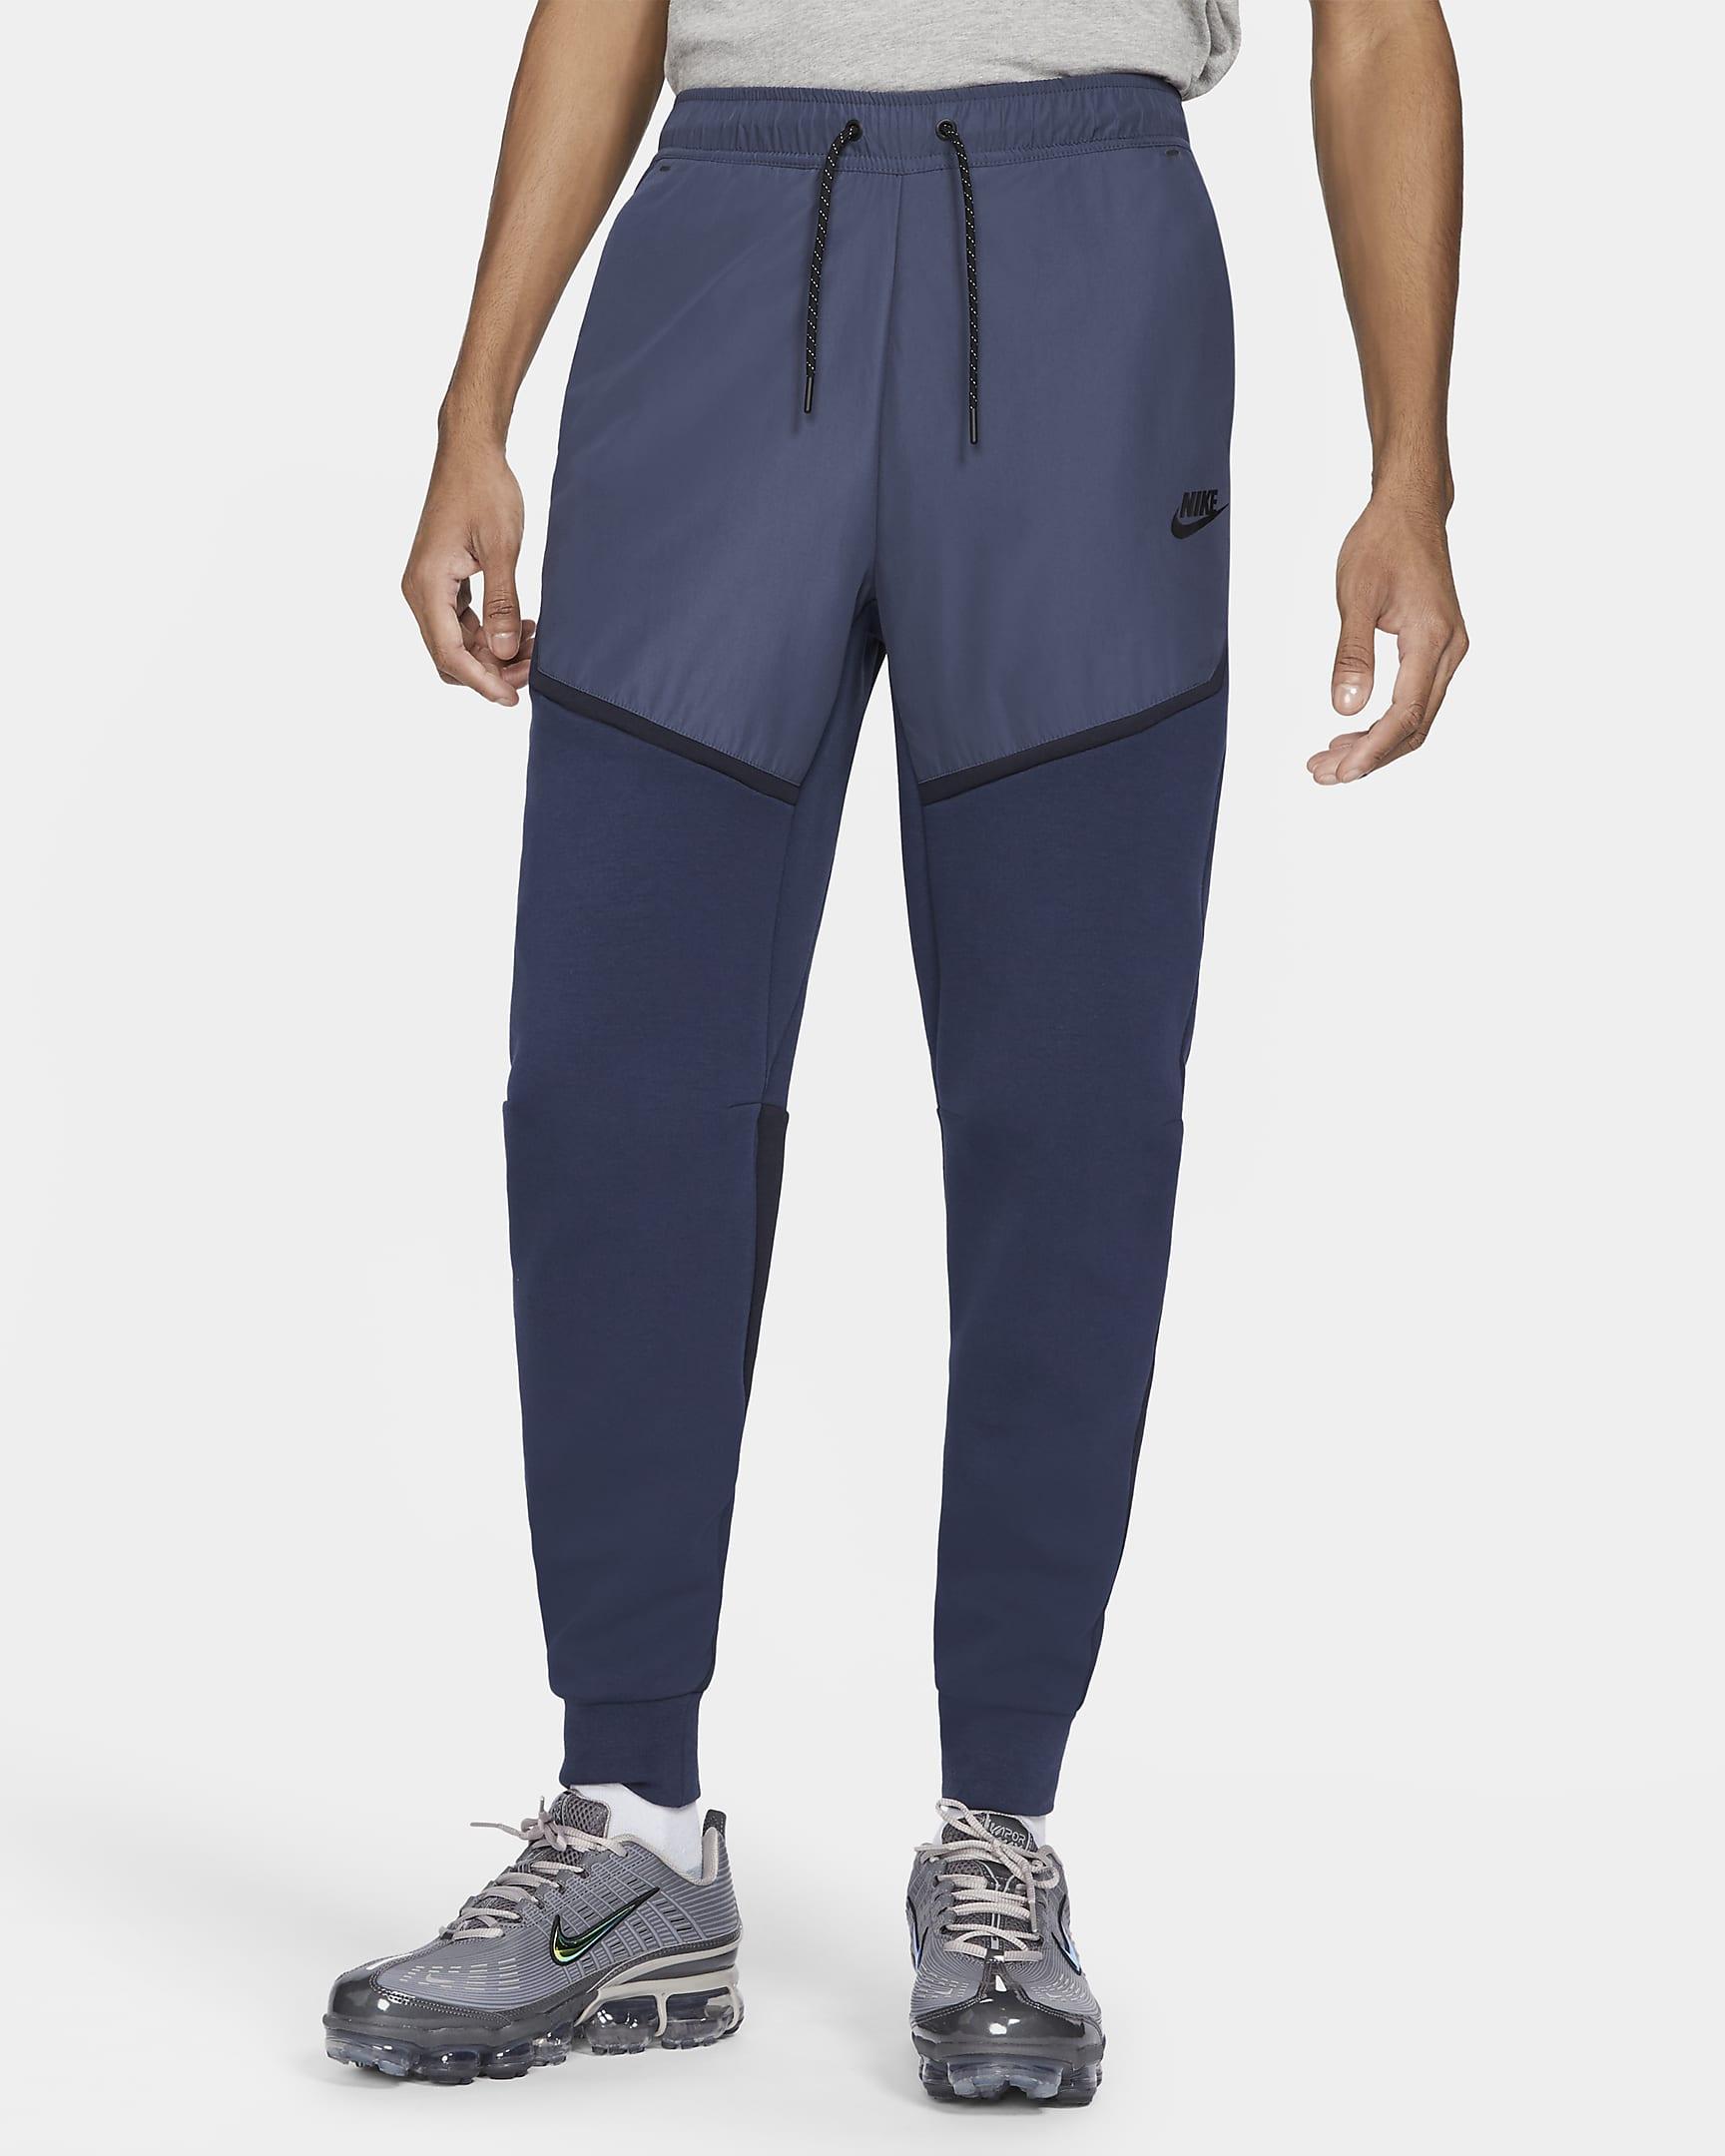 sportswear-tech-fleece-mens-woven-joggers-1CXCbB